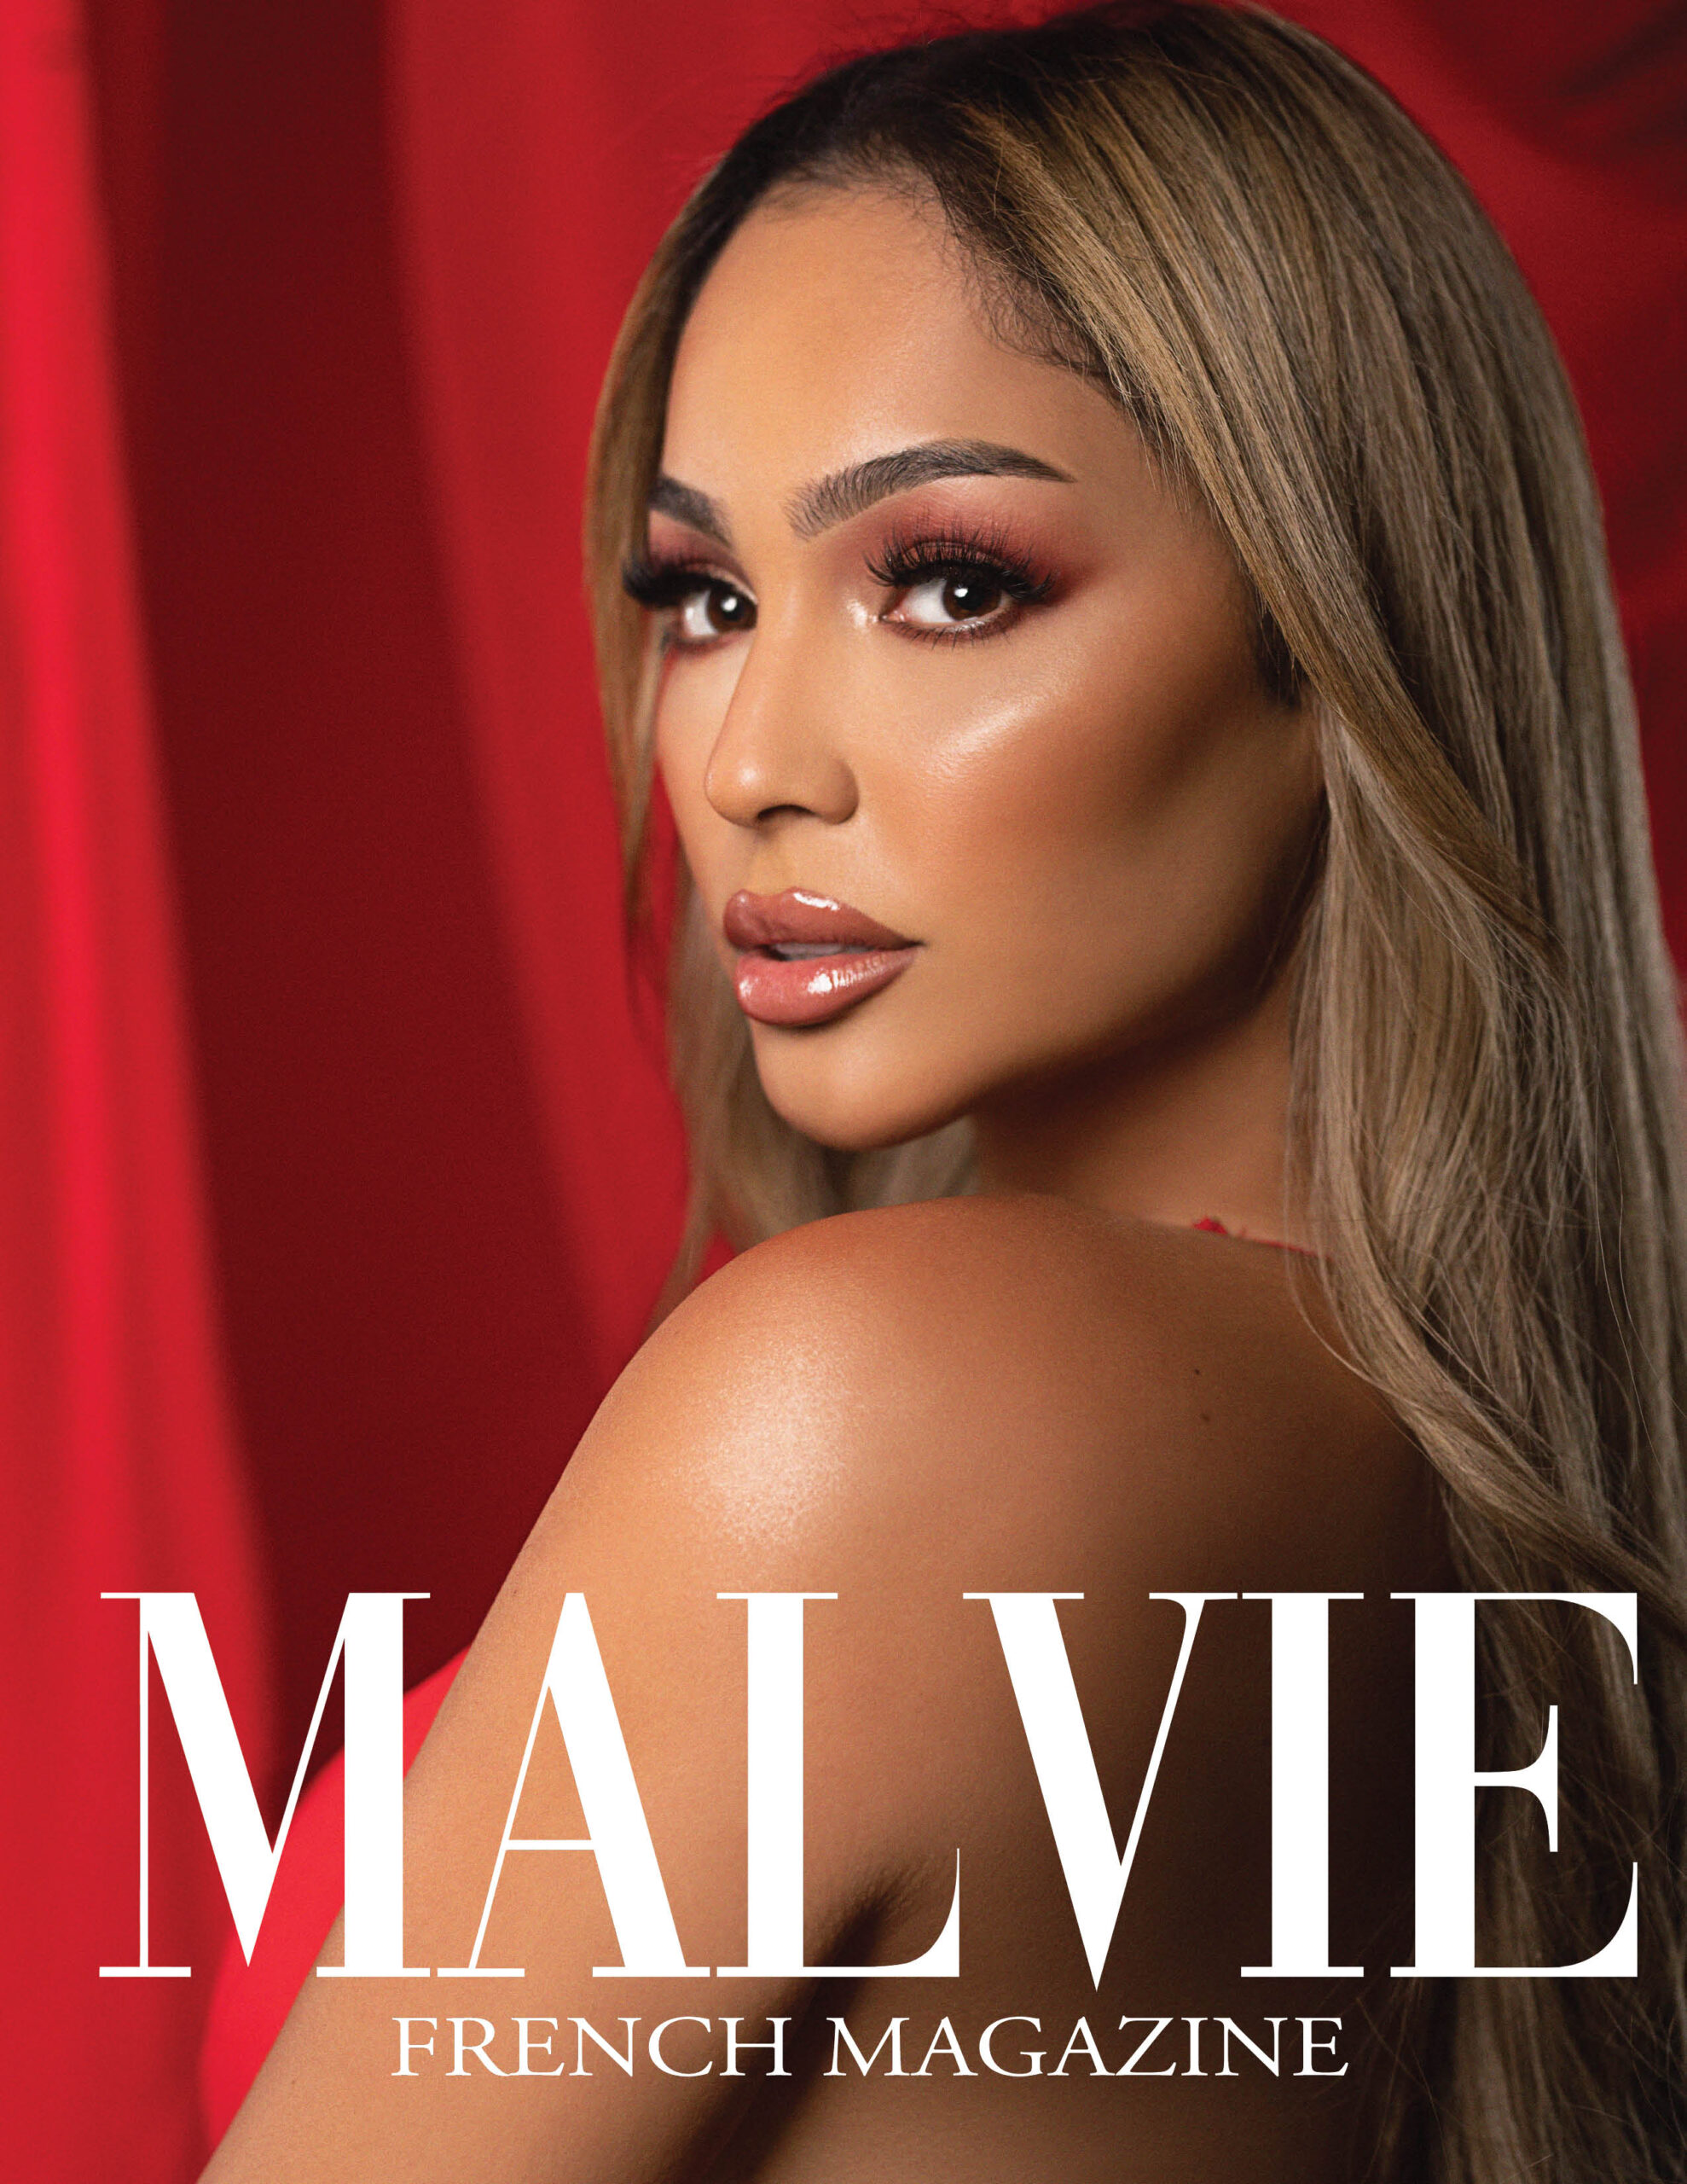 MALVIE Magazine The Artist Edition Vol 128 January 2021 74